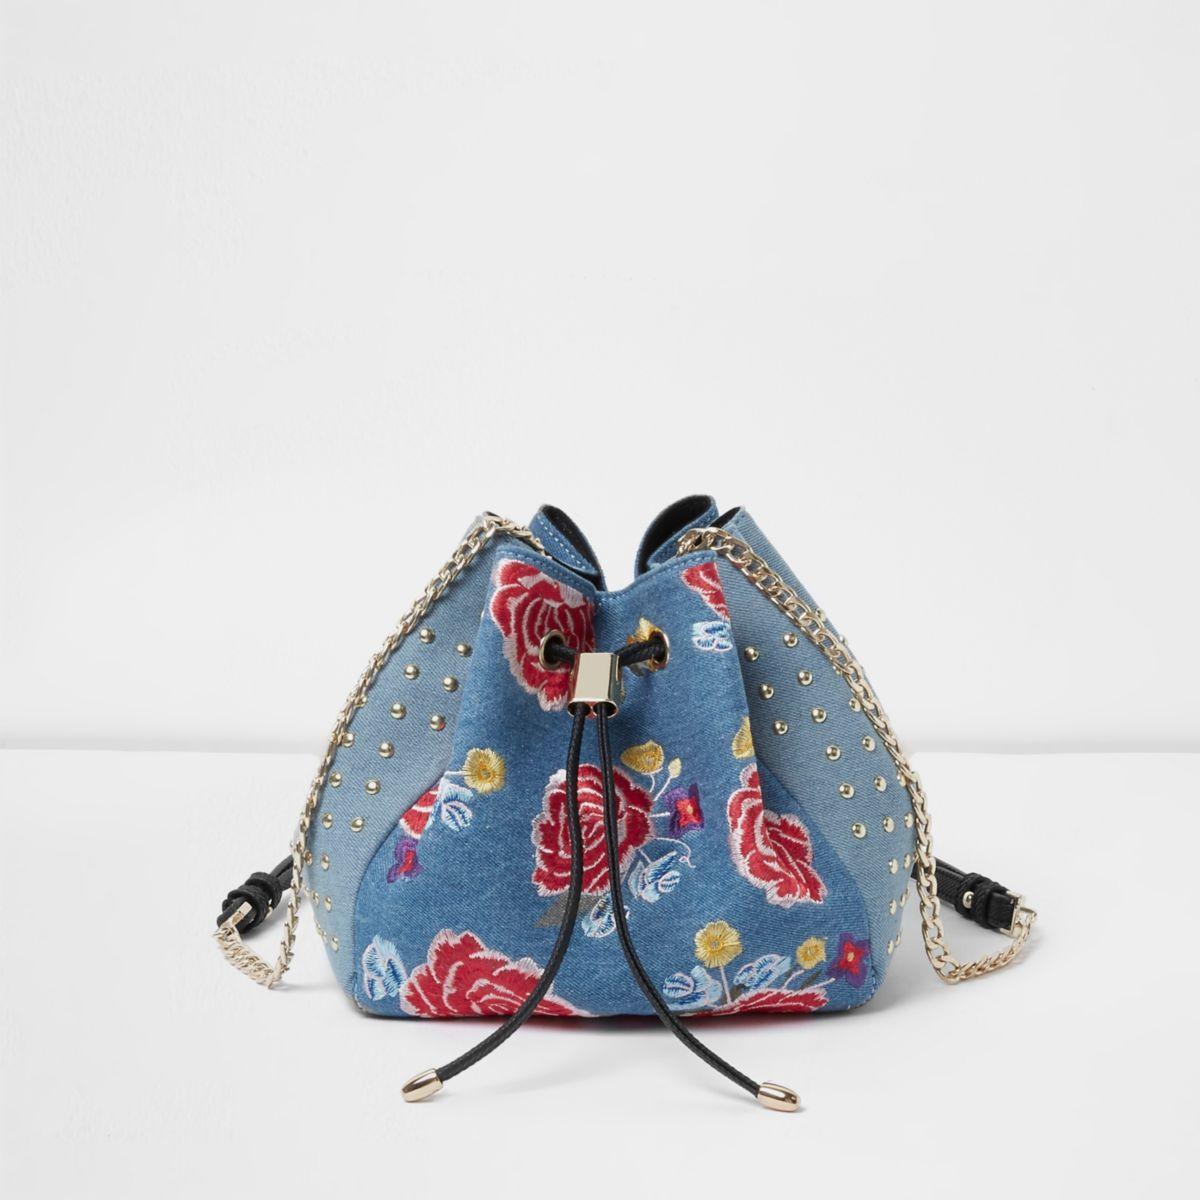 Blue Denim Floral Embroidered Duffle Bag - Shoulder Bags - Bags U0026 Purses - Women